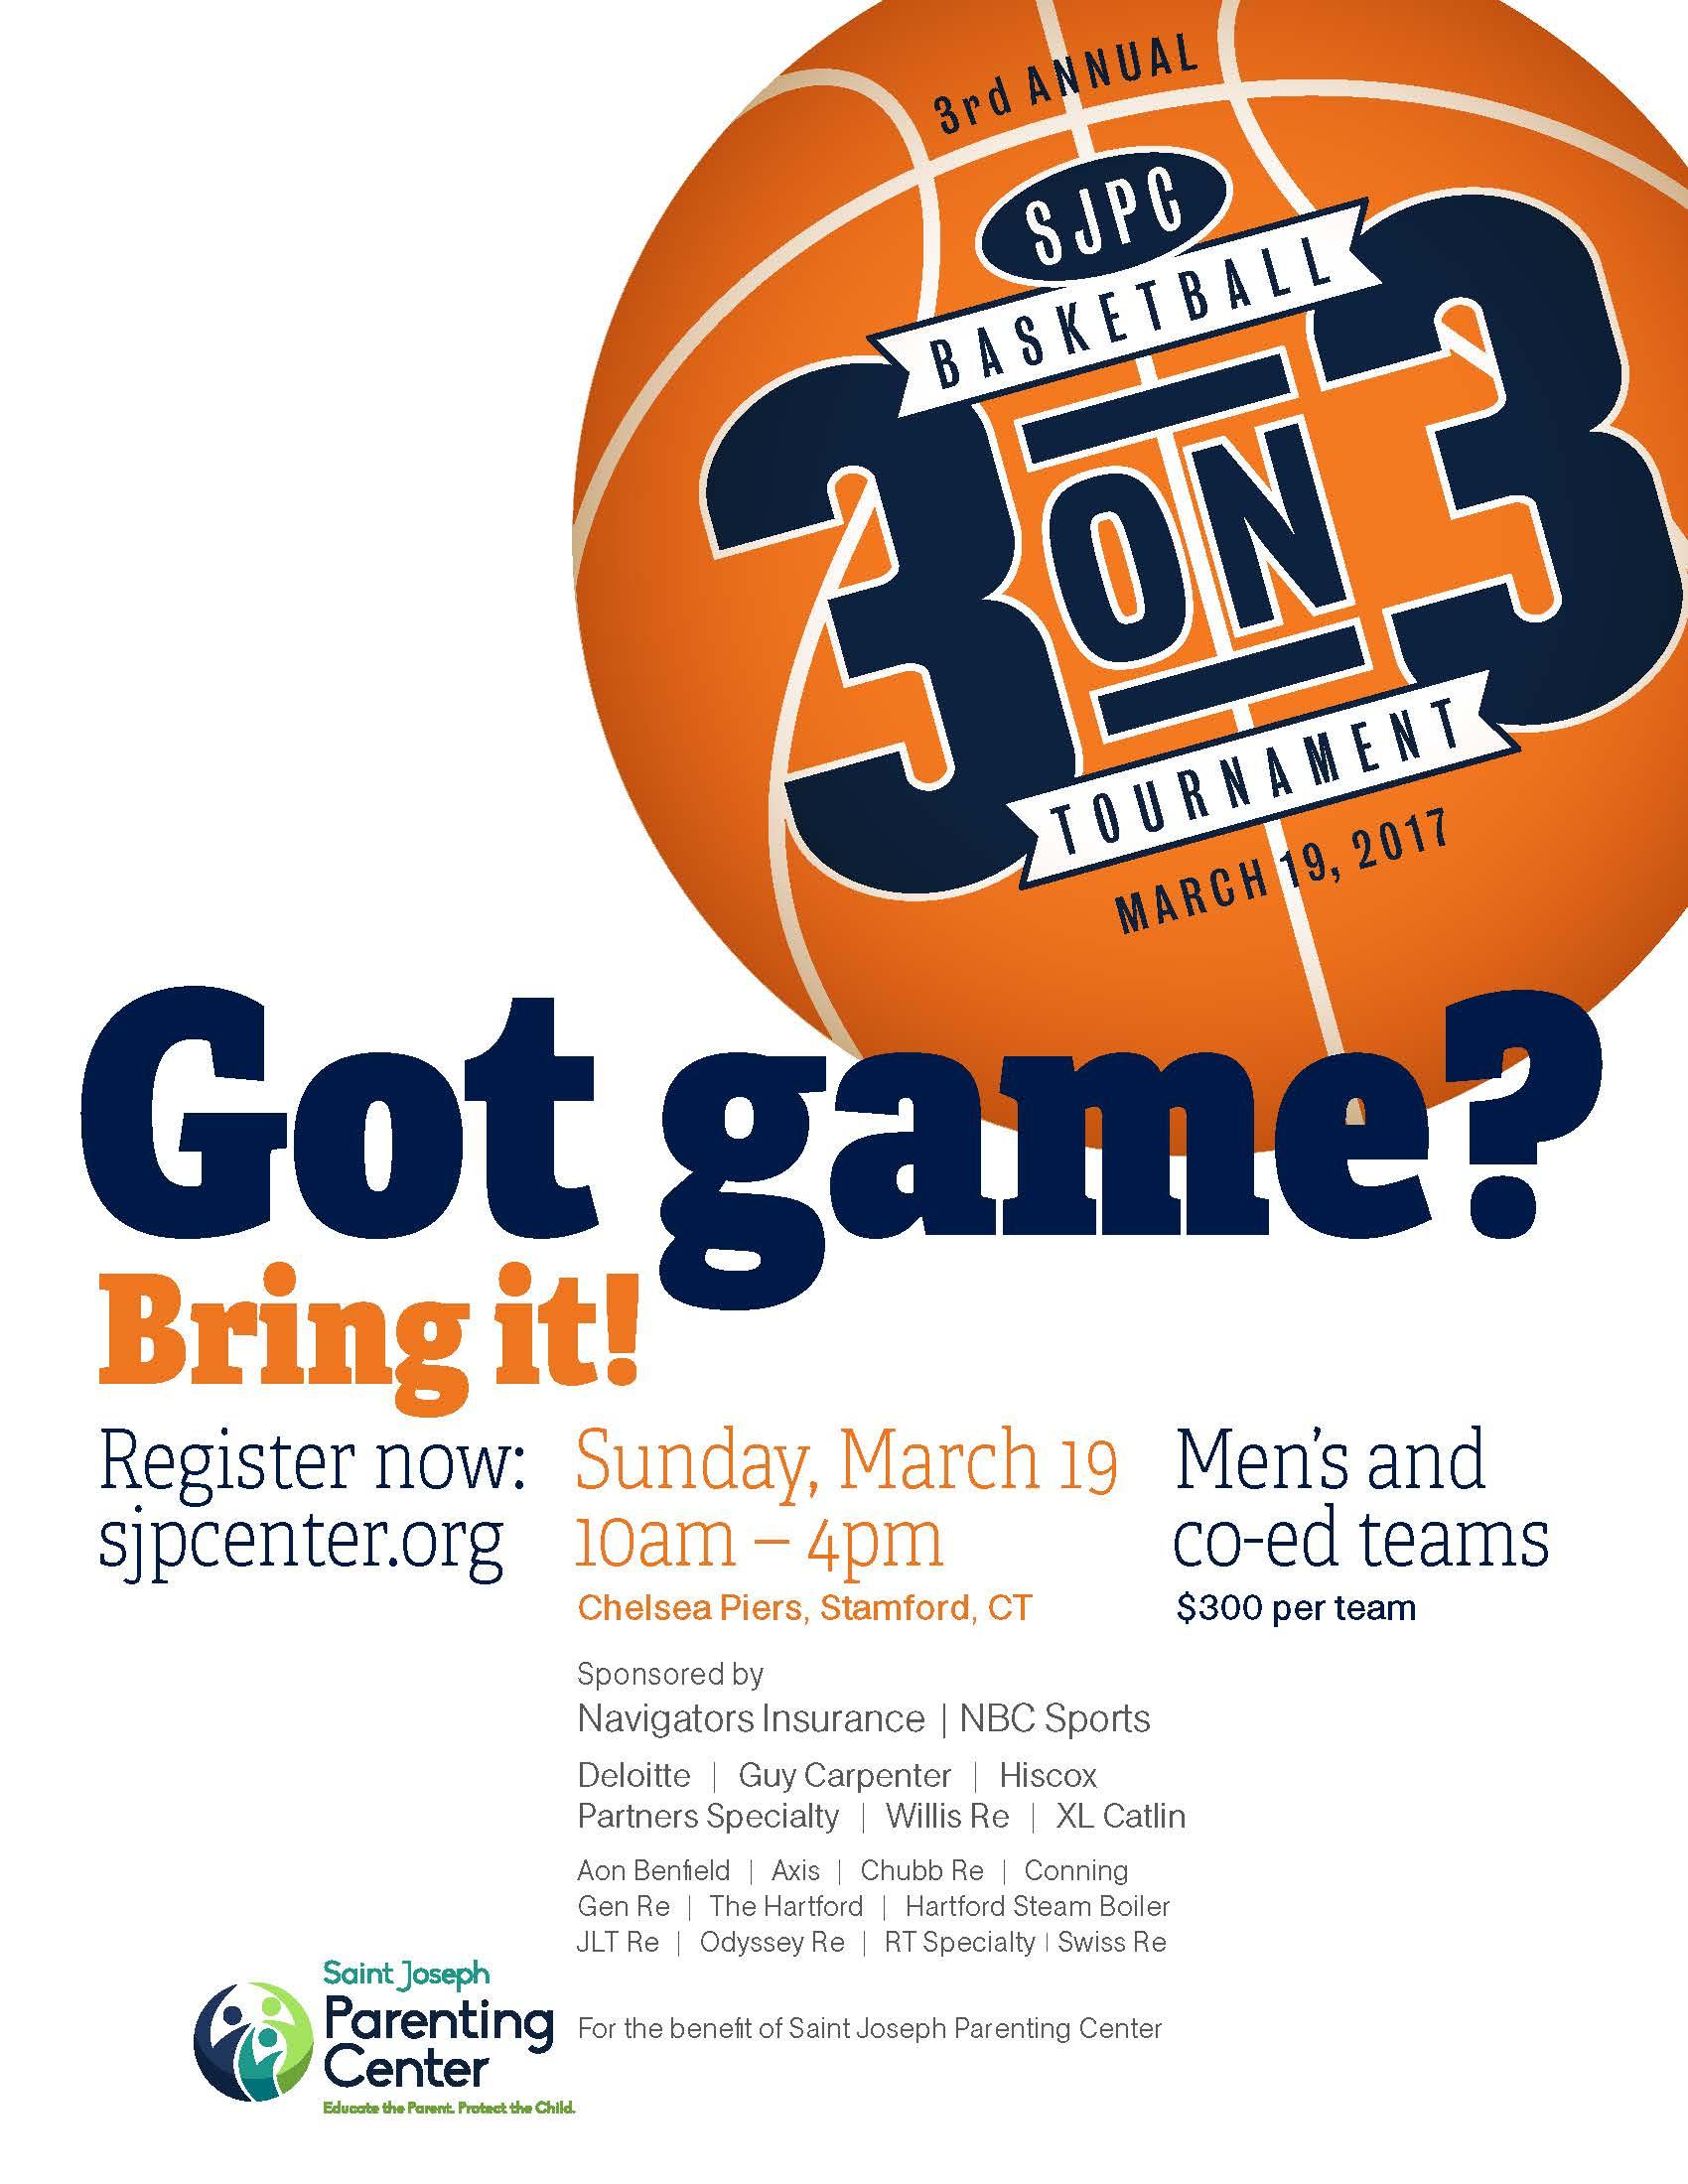 Saint Joseph Parenting Center 3 On 3 Hoops Tournament Fairfield Countys Community Foundation